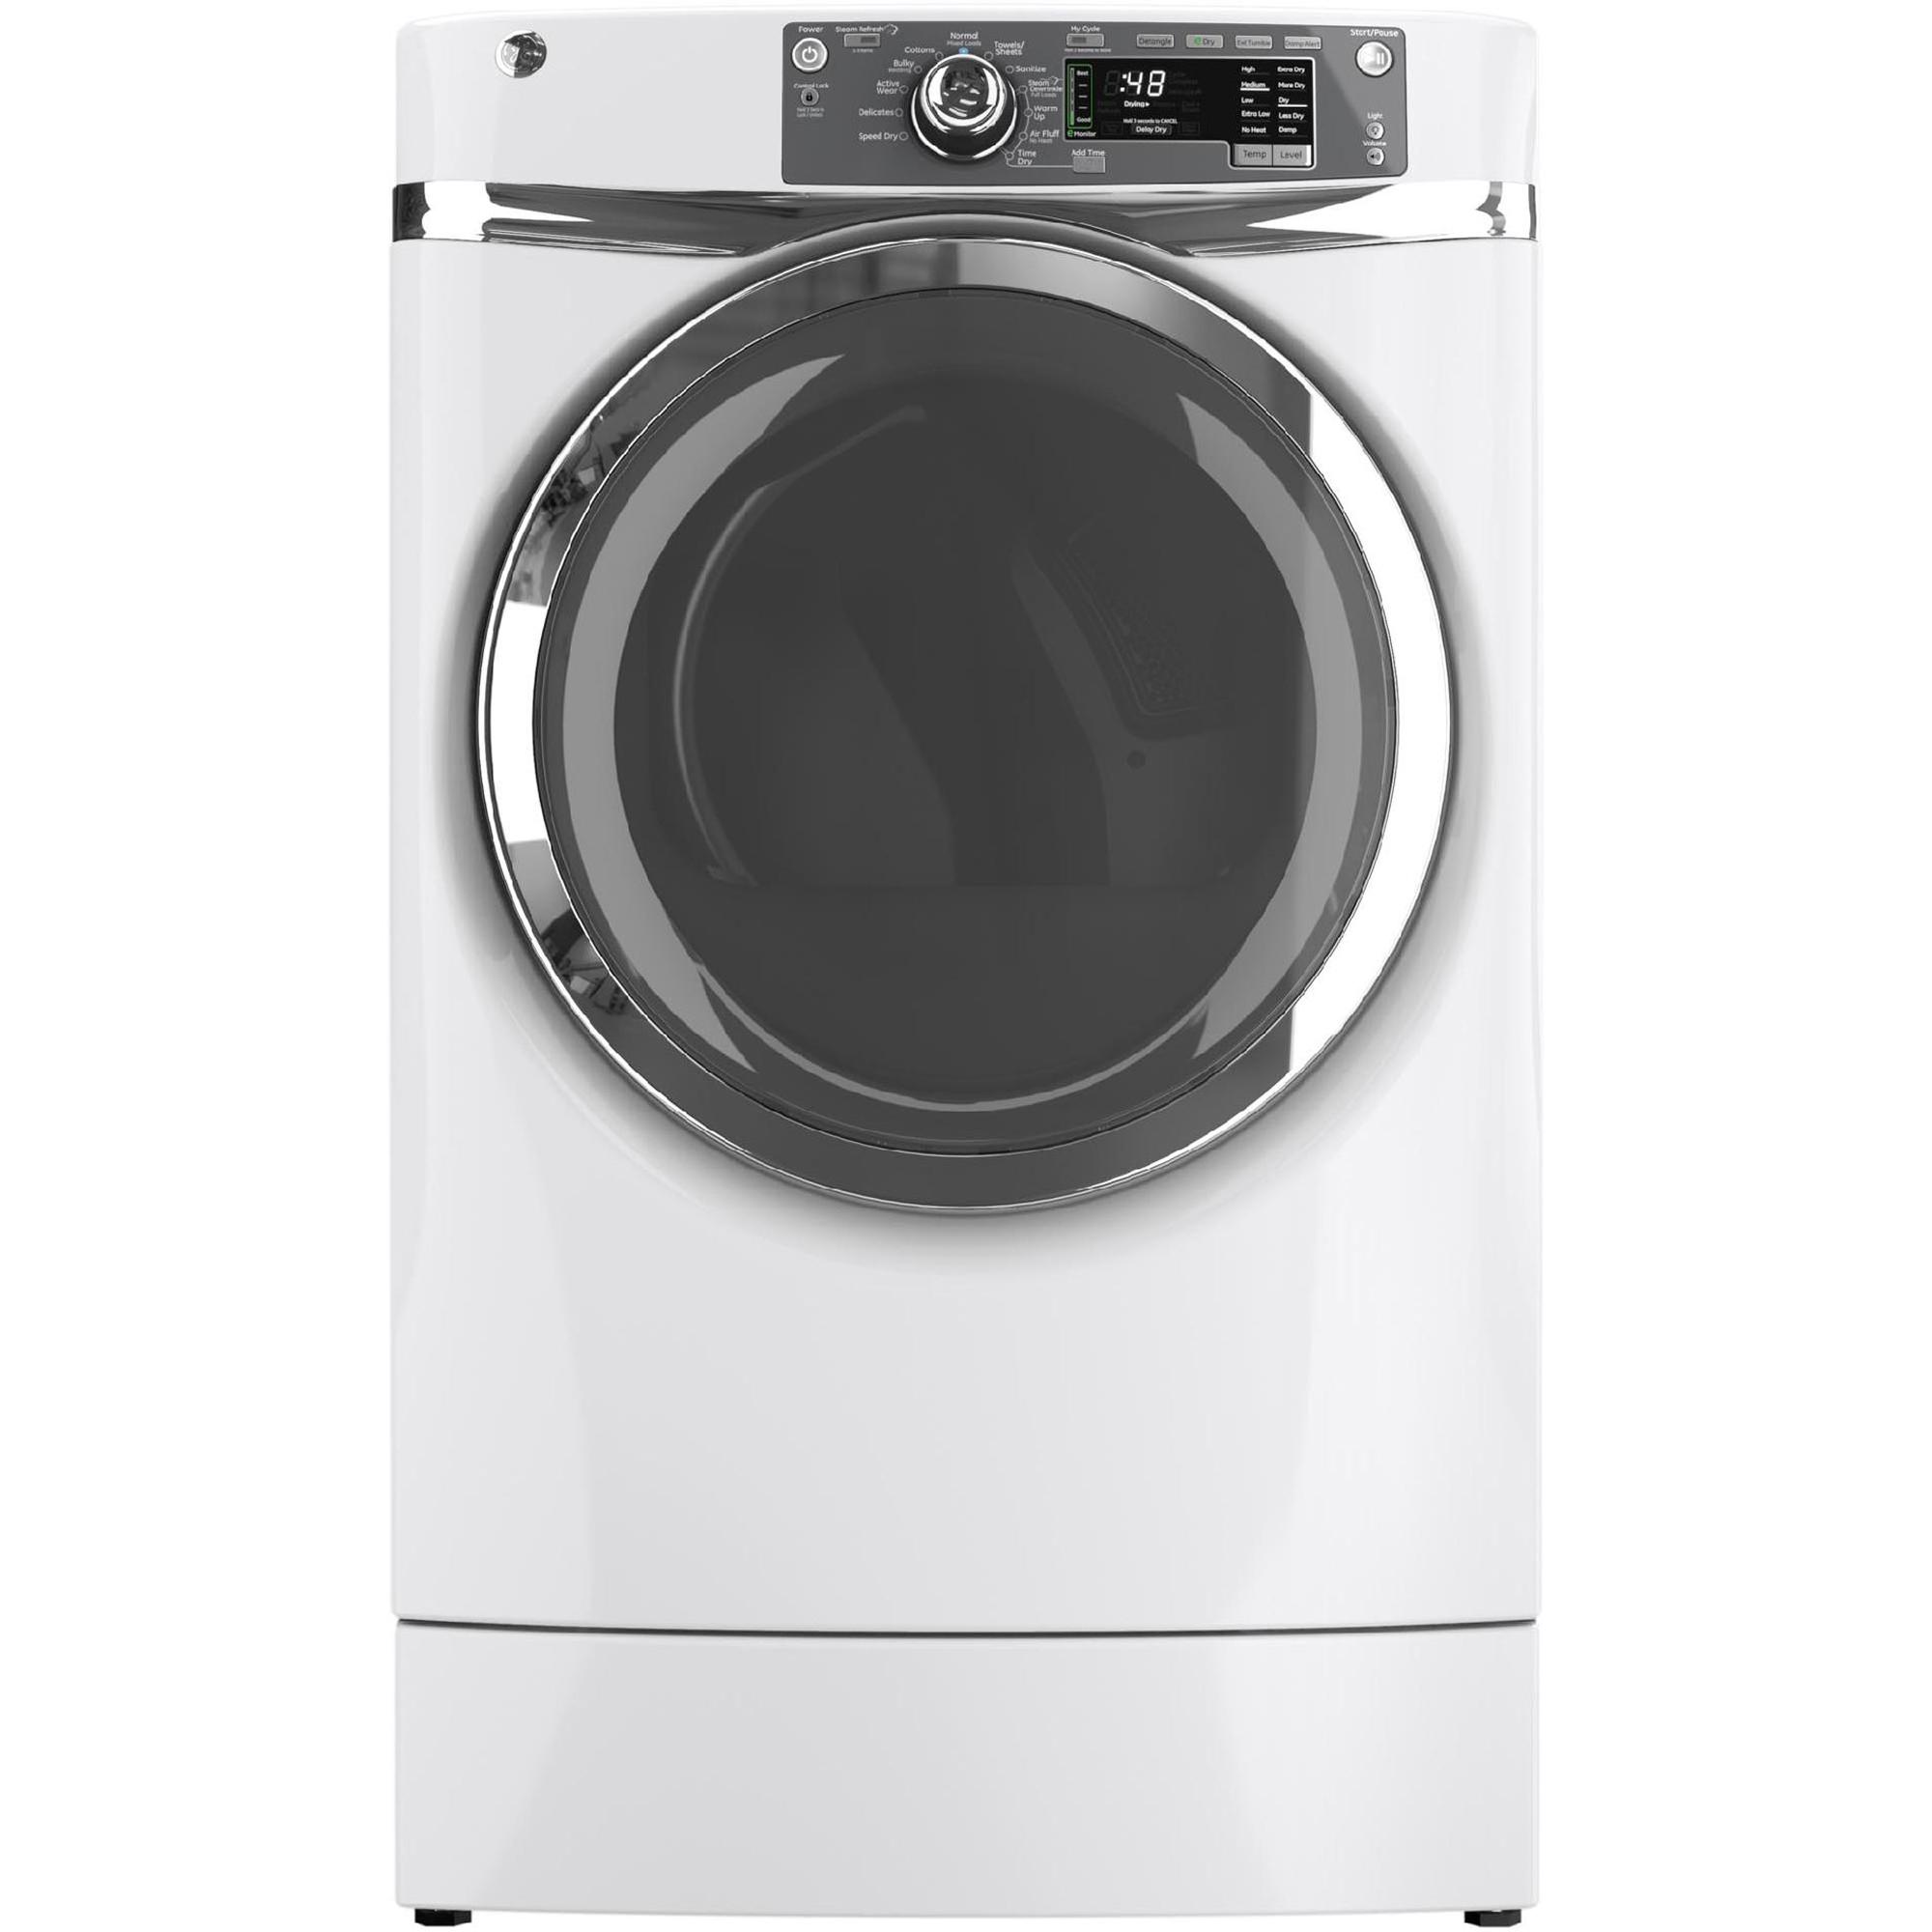 GE Appliances GFDR480GFWW 8.3 cu. ft. RightHeight™ Design Gas Dryer w/ Steam - White